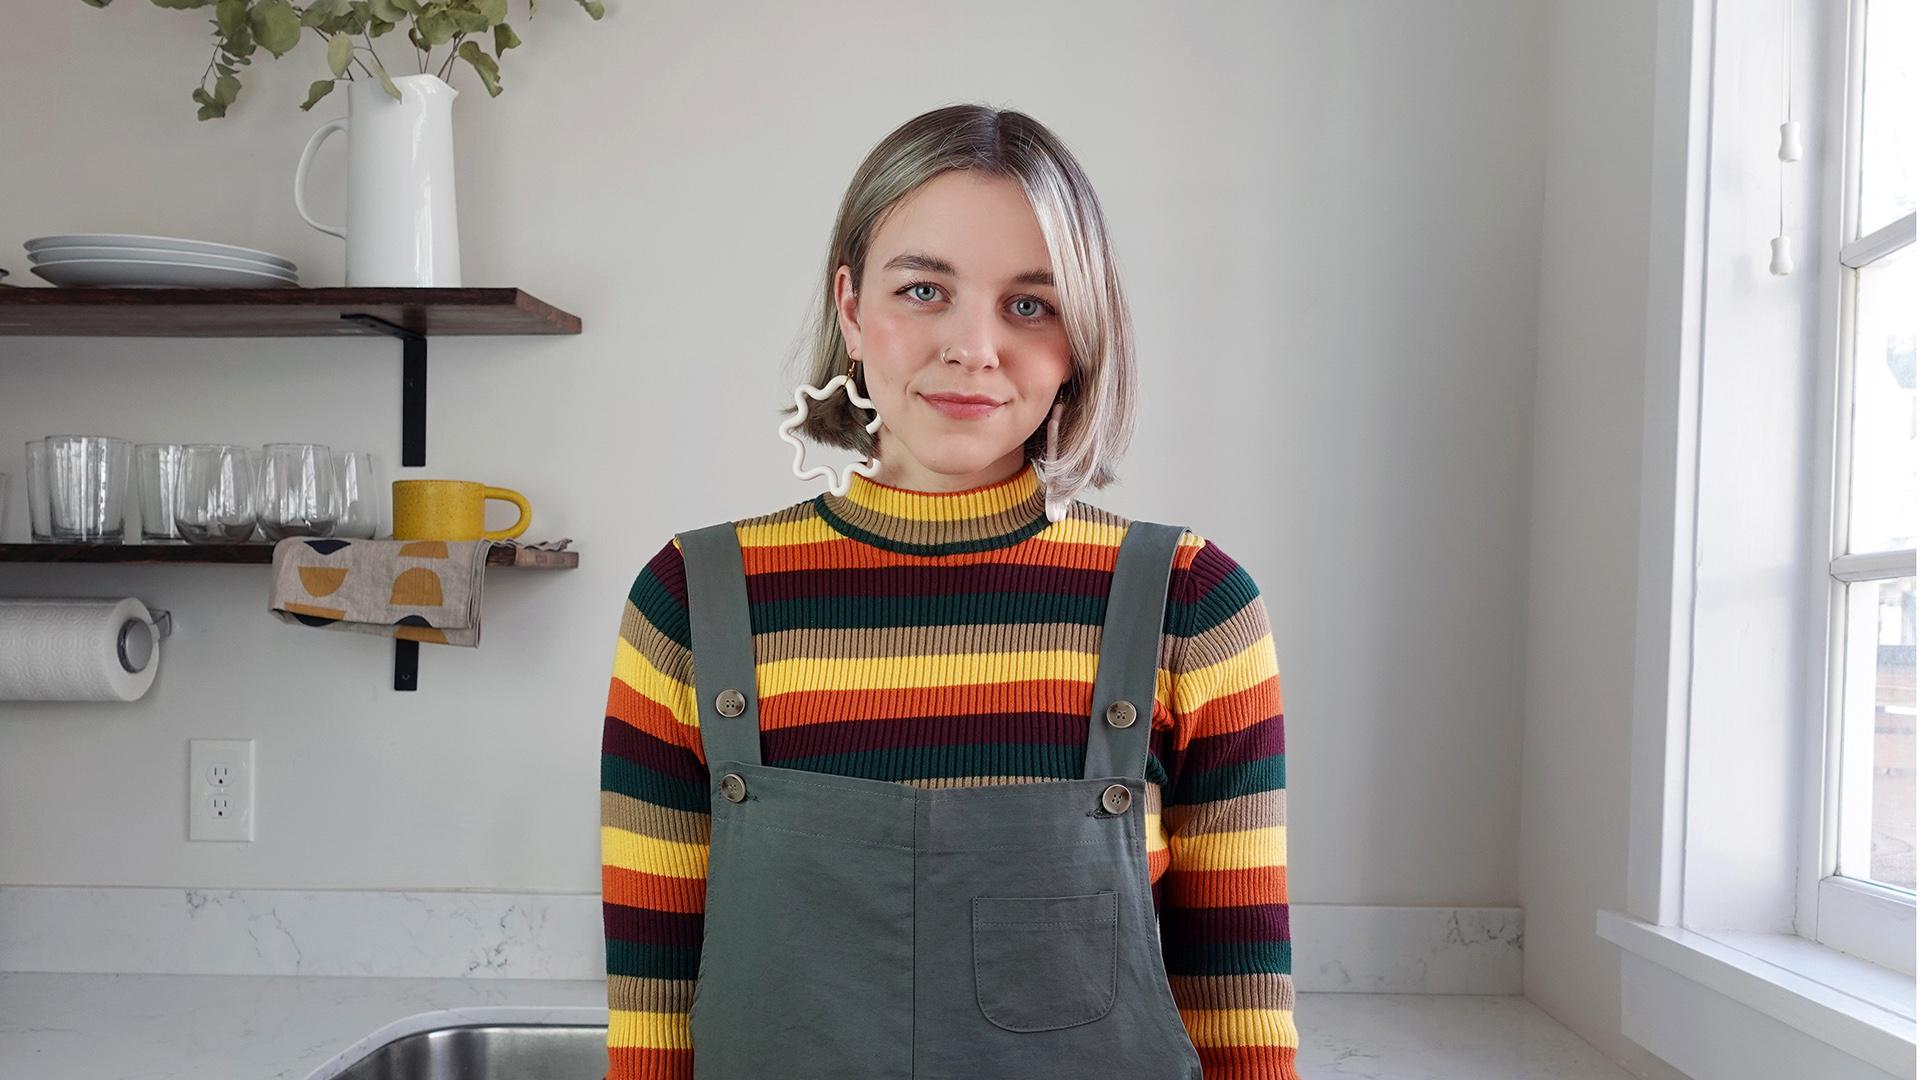 Sarah Beth Morgan Joins Hornet